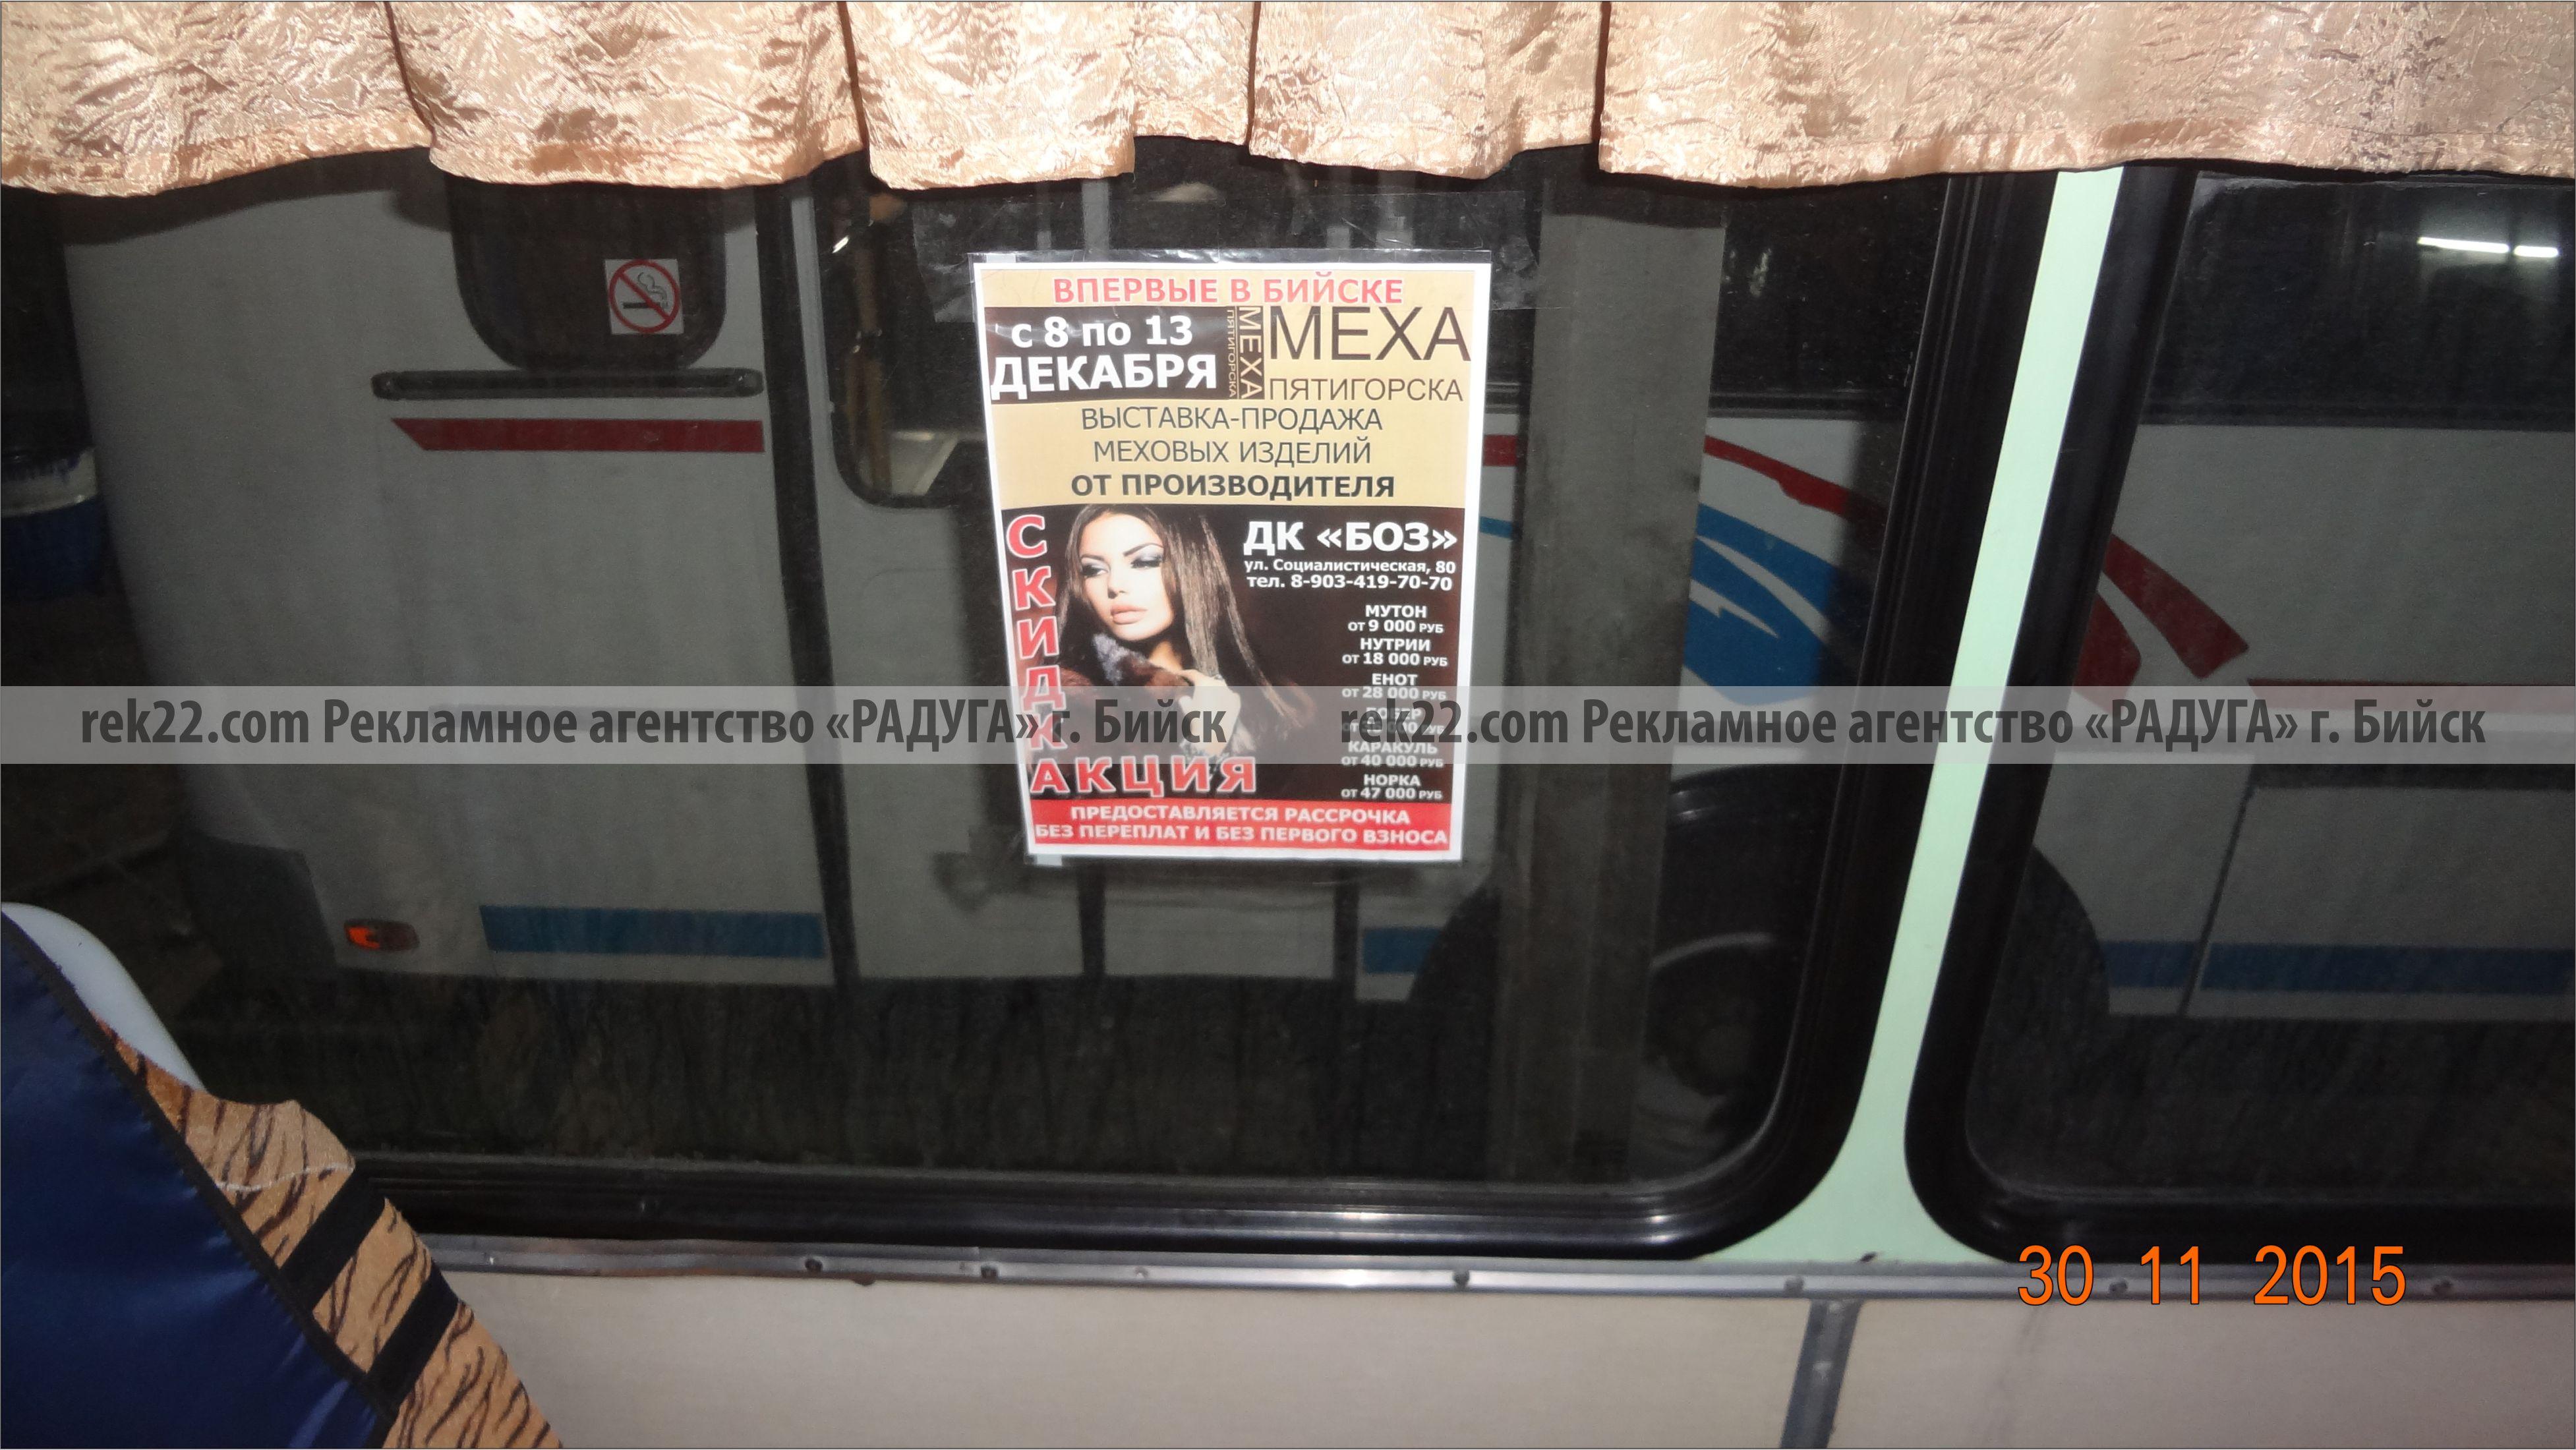 Реклама на транспорте Бийск - листовки - 12